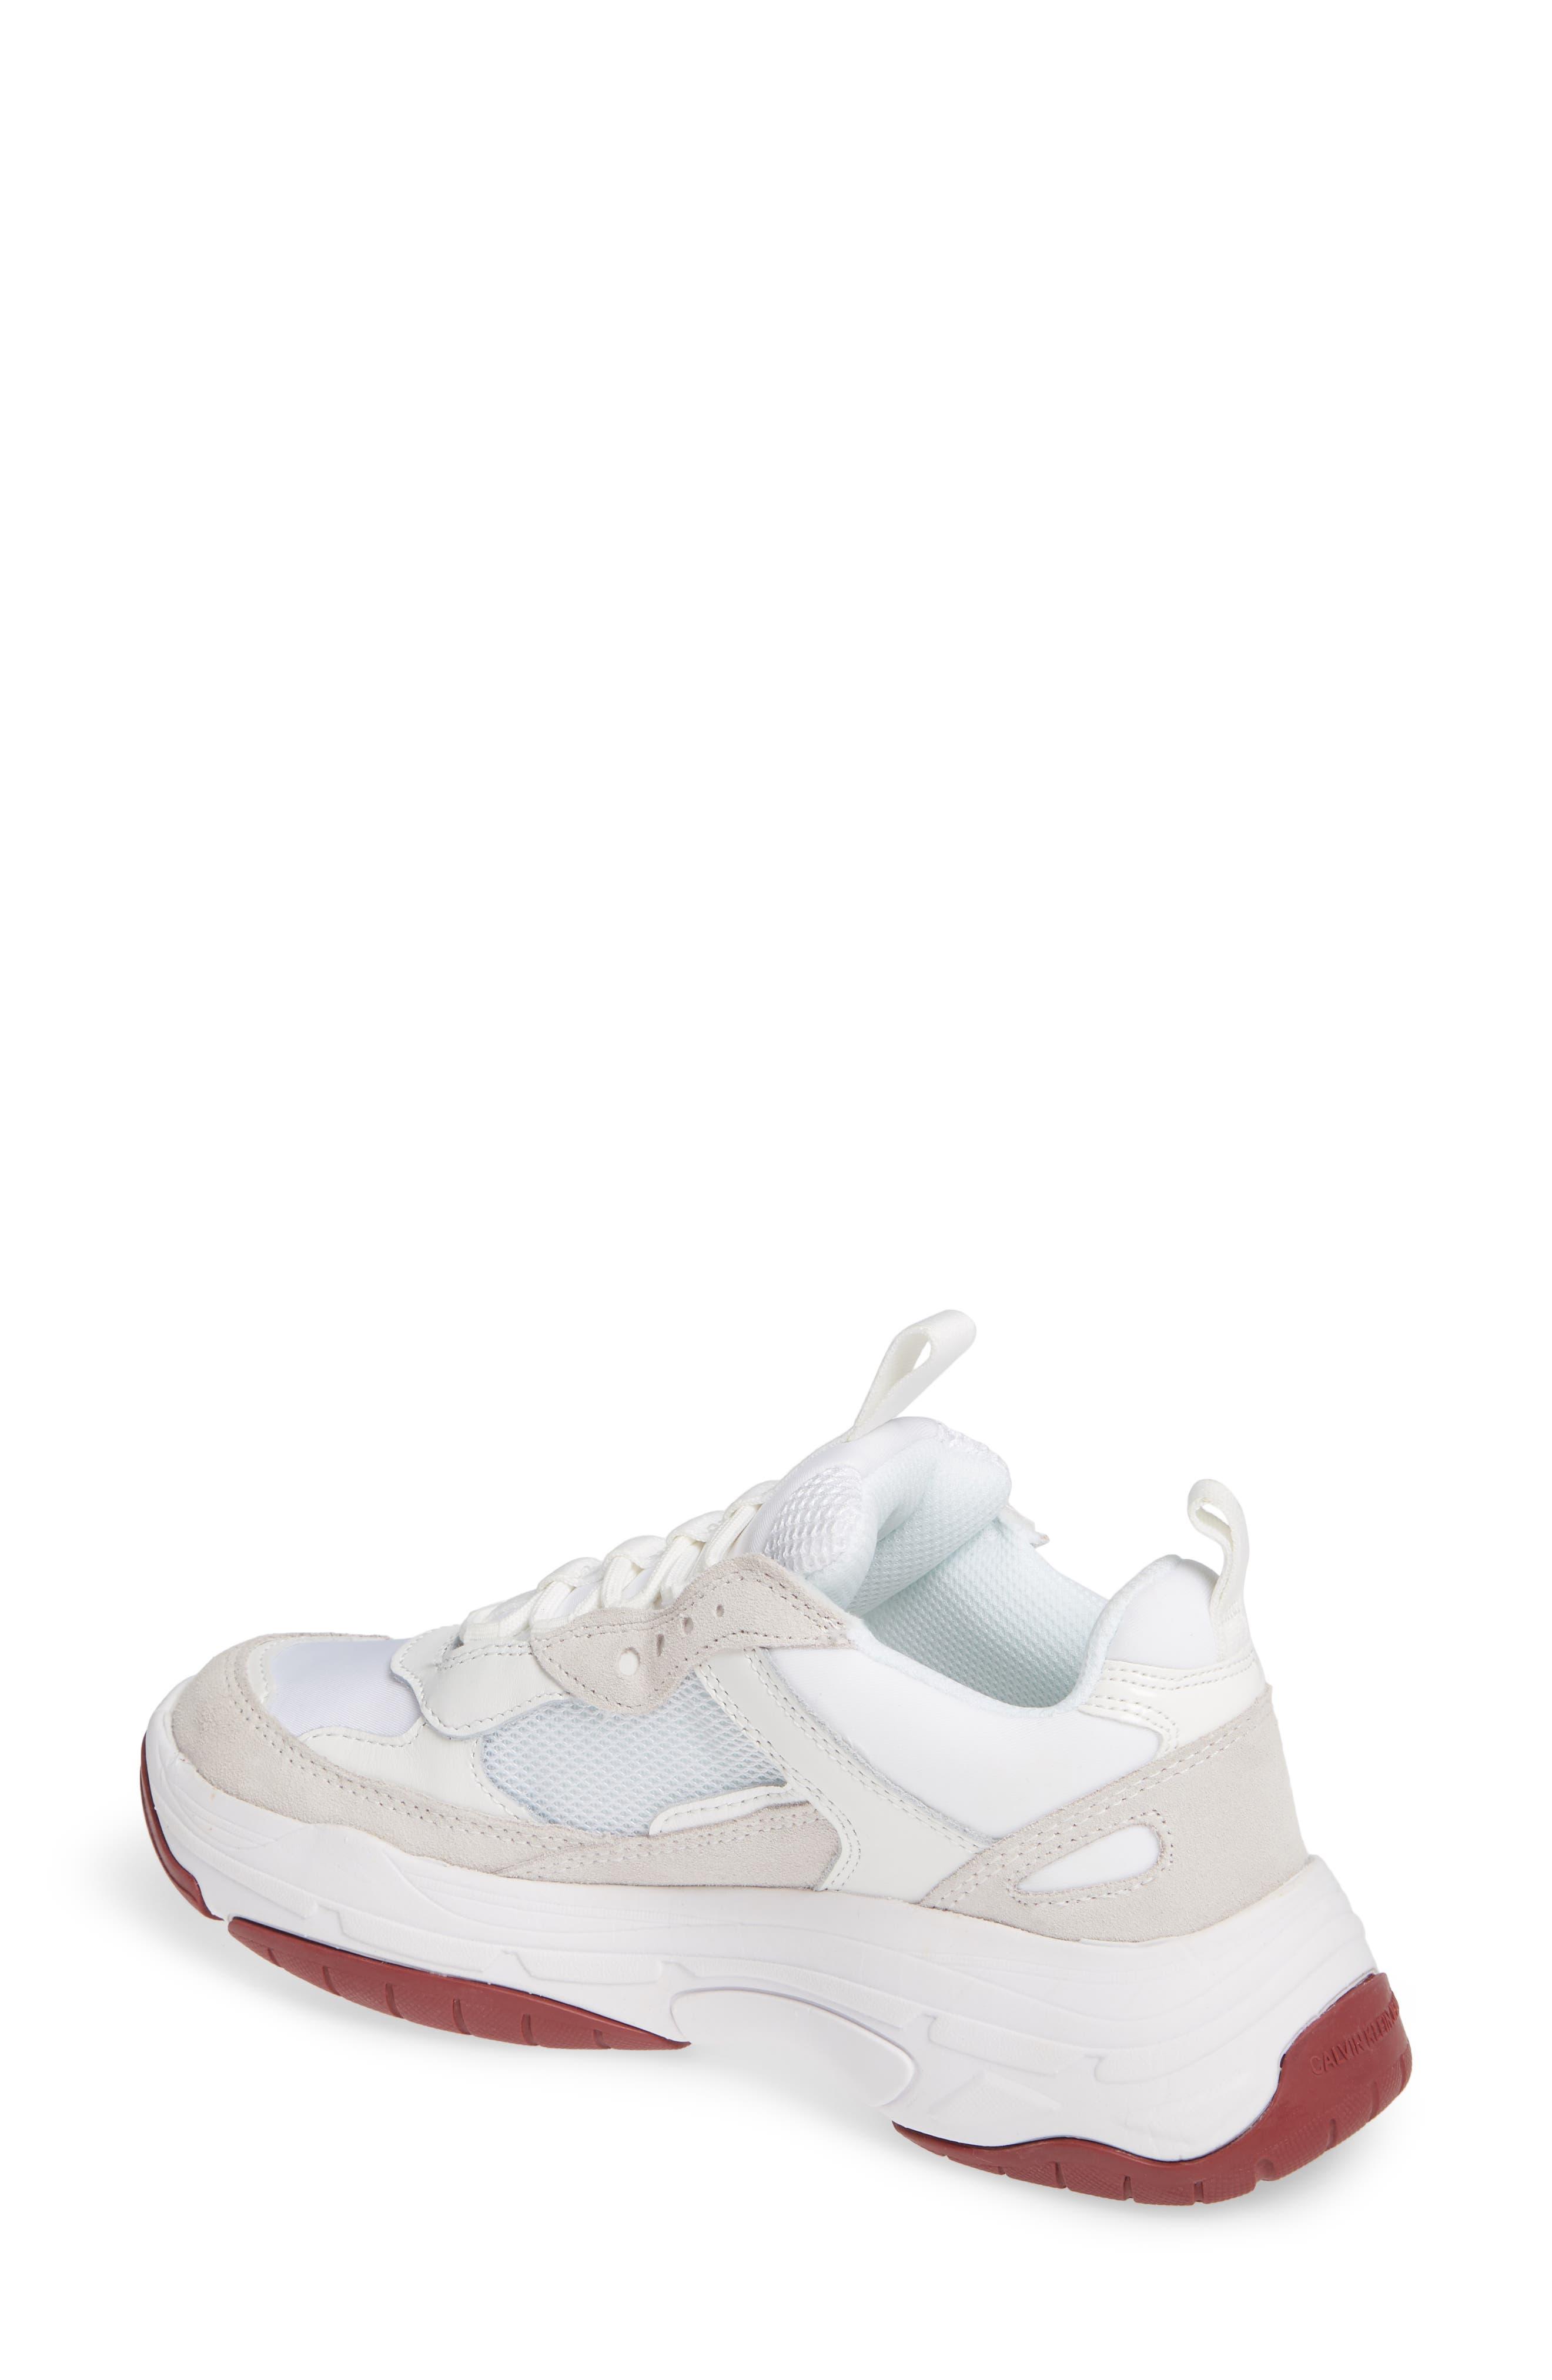 Maya Sneaker,                             Alternate thumbnail 2, color,                             WHITE FABRIC